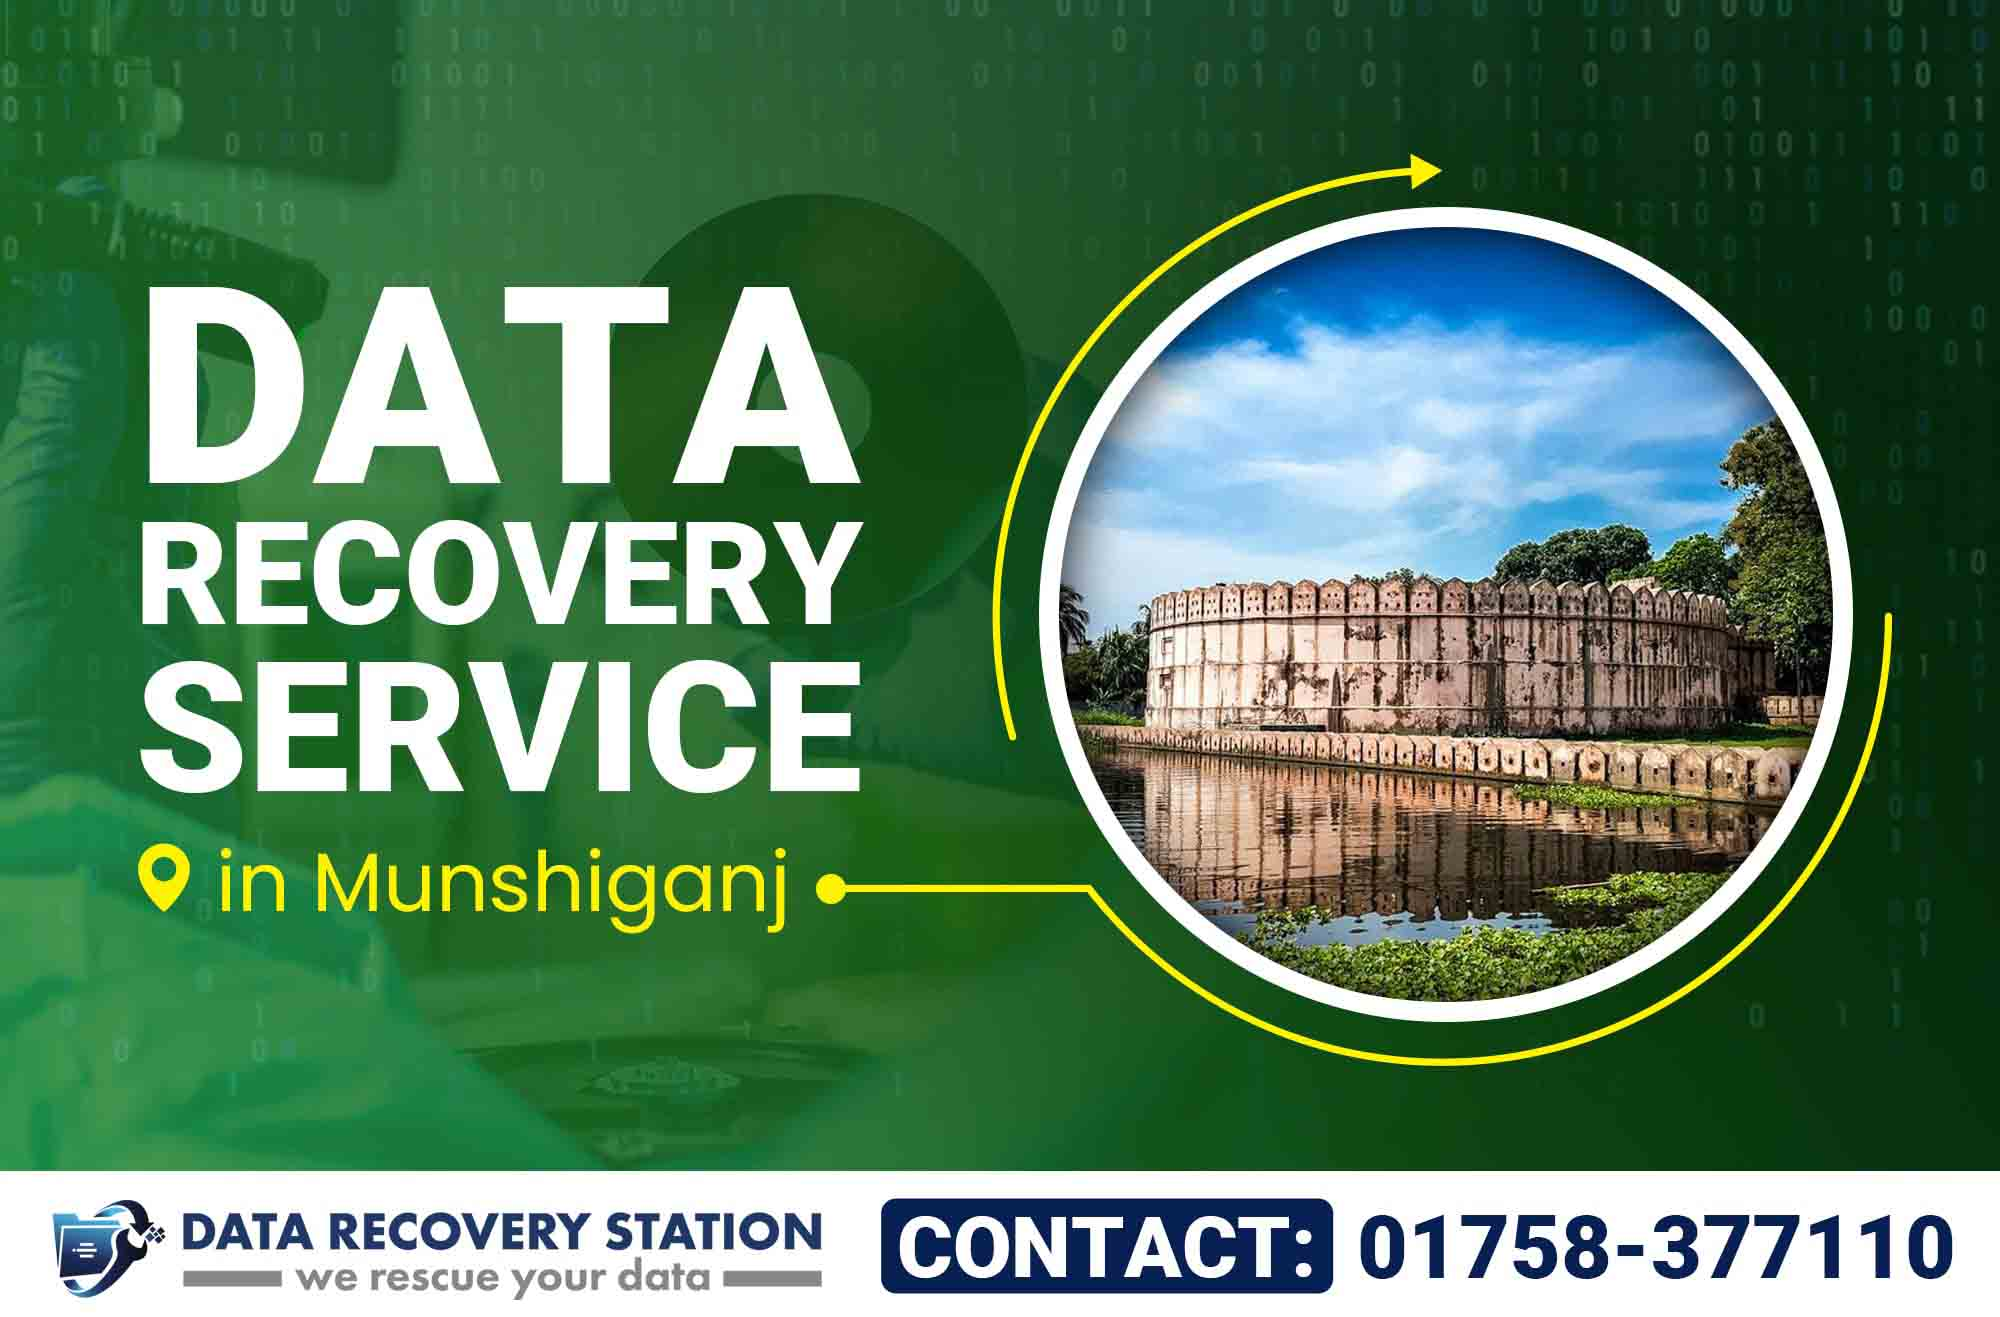 Data Recovery Service in Munshiganj